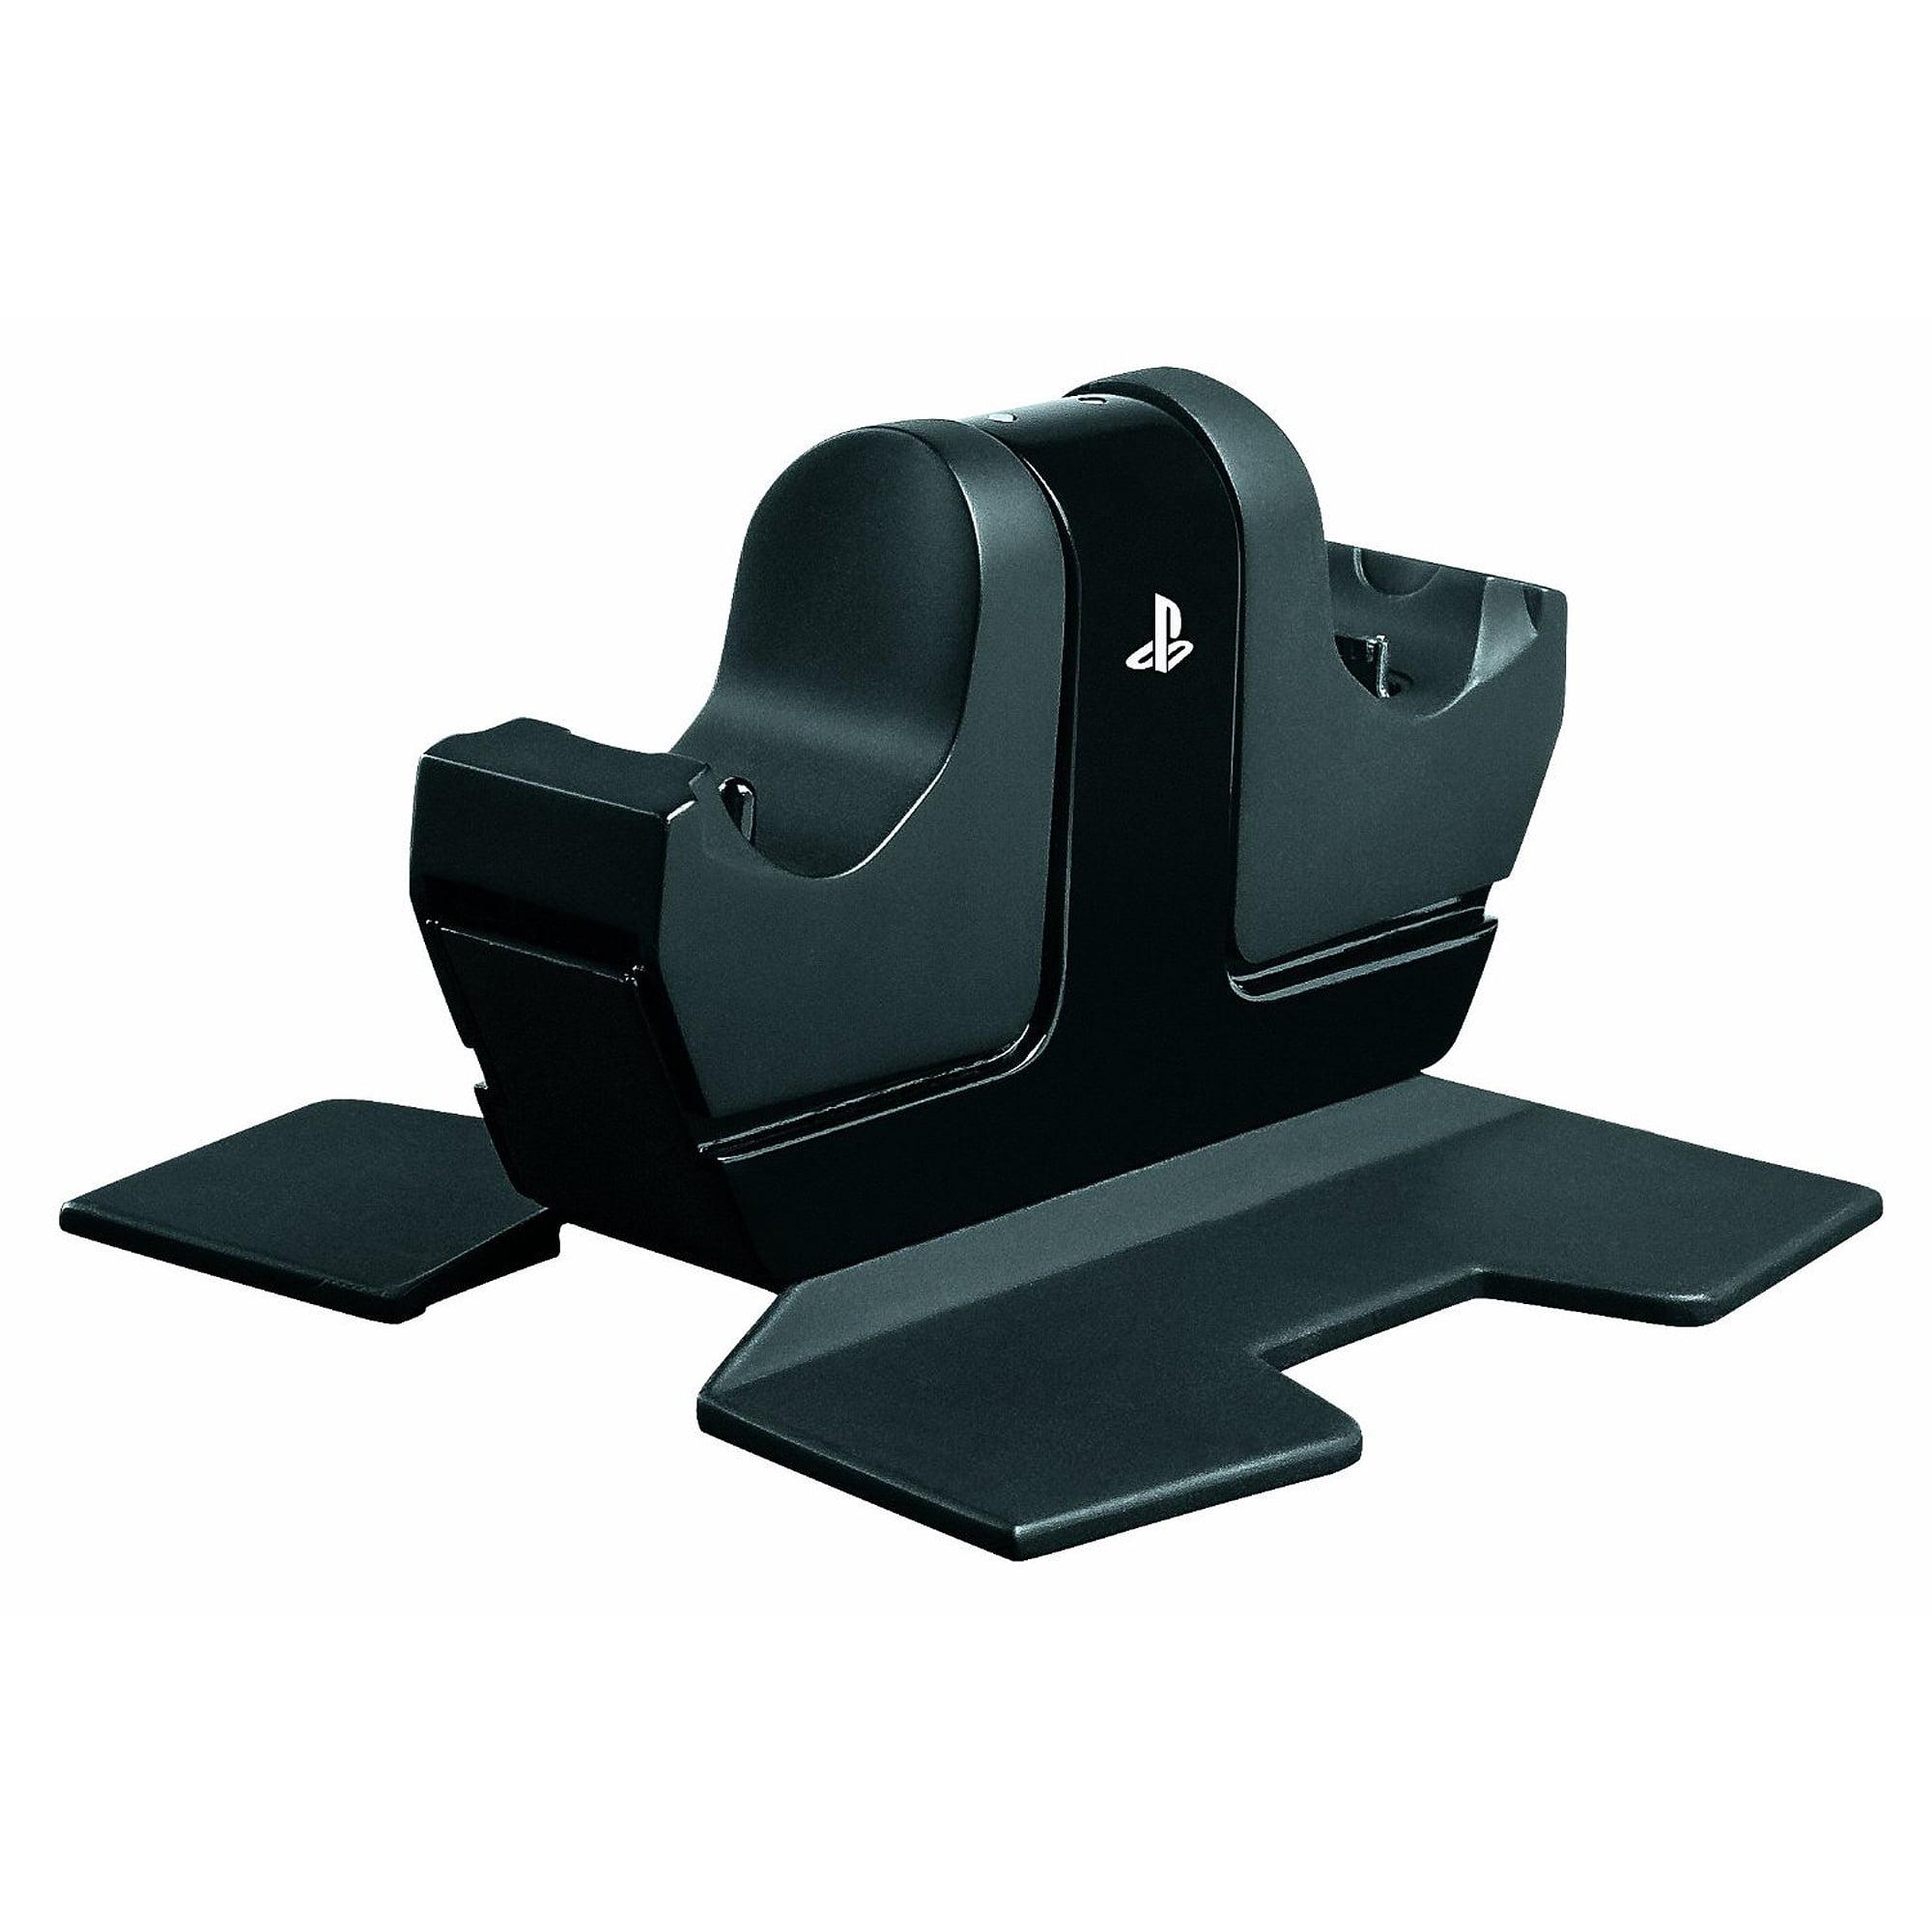 Estación de carga nyko Modular para DualShock 4, negro (PS4) + Nyko en Veo y Compro